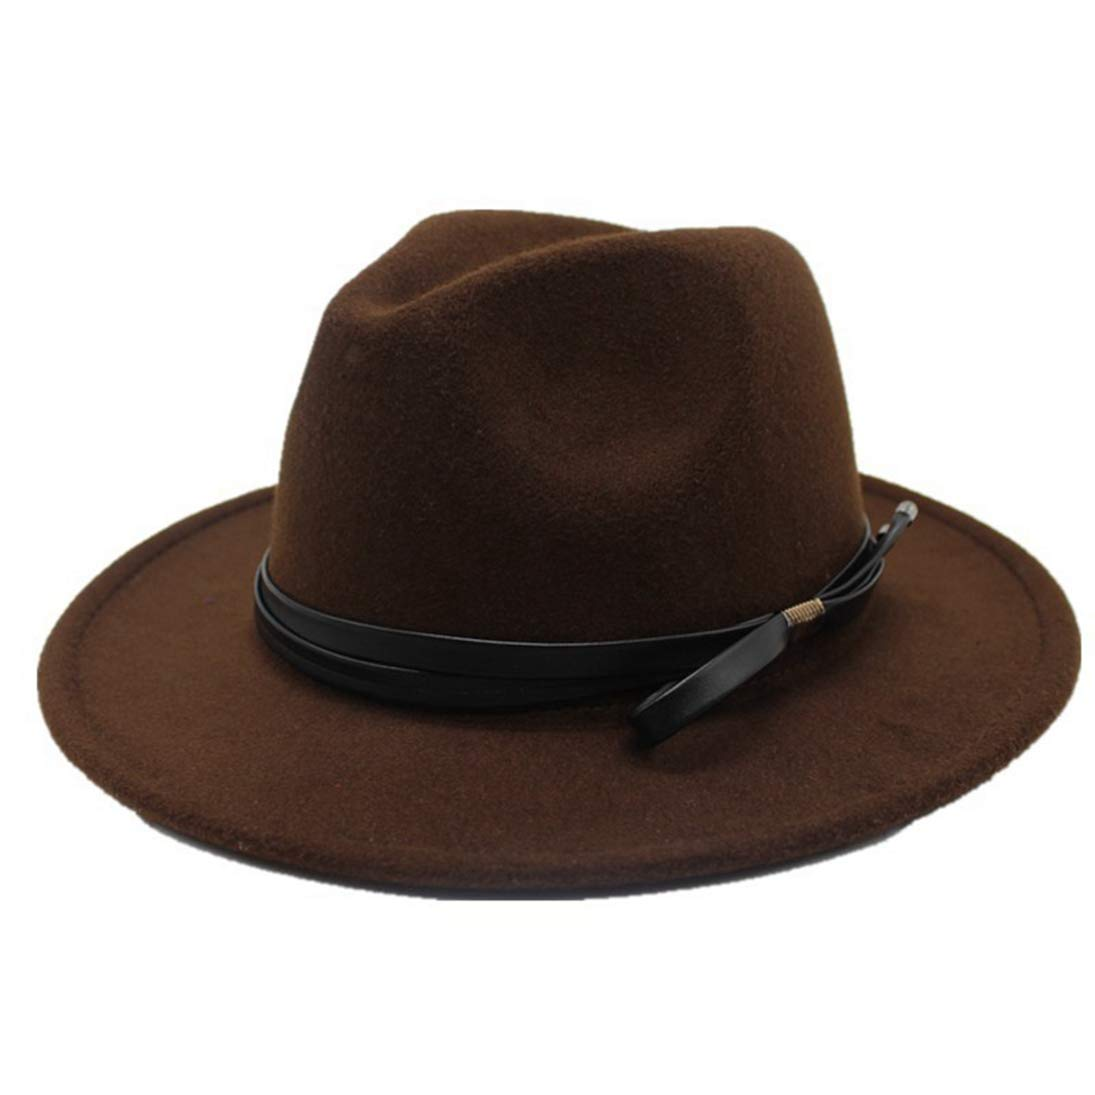 Fedora Hats Unisex Classic Timeless Wool Felt Hat Winter Ladies Elegant Vintage Wide Brim Jazz Hat Round Cap